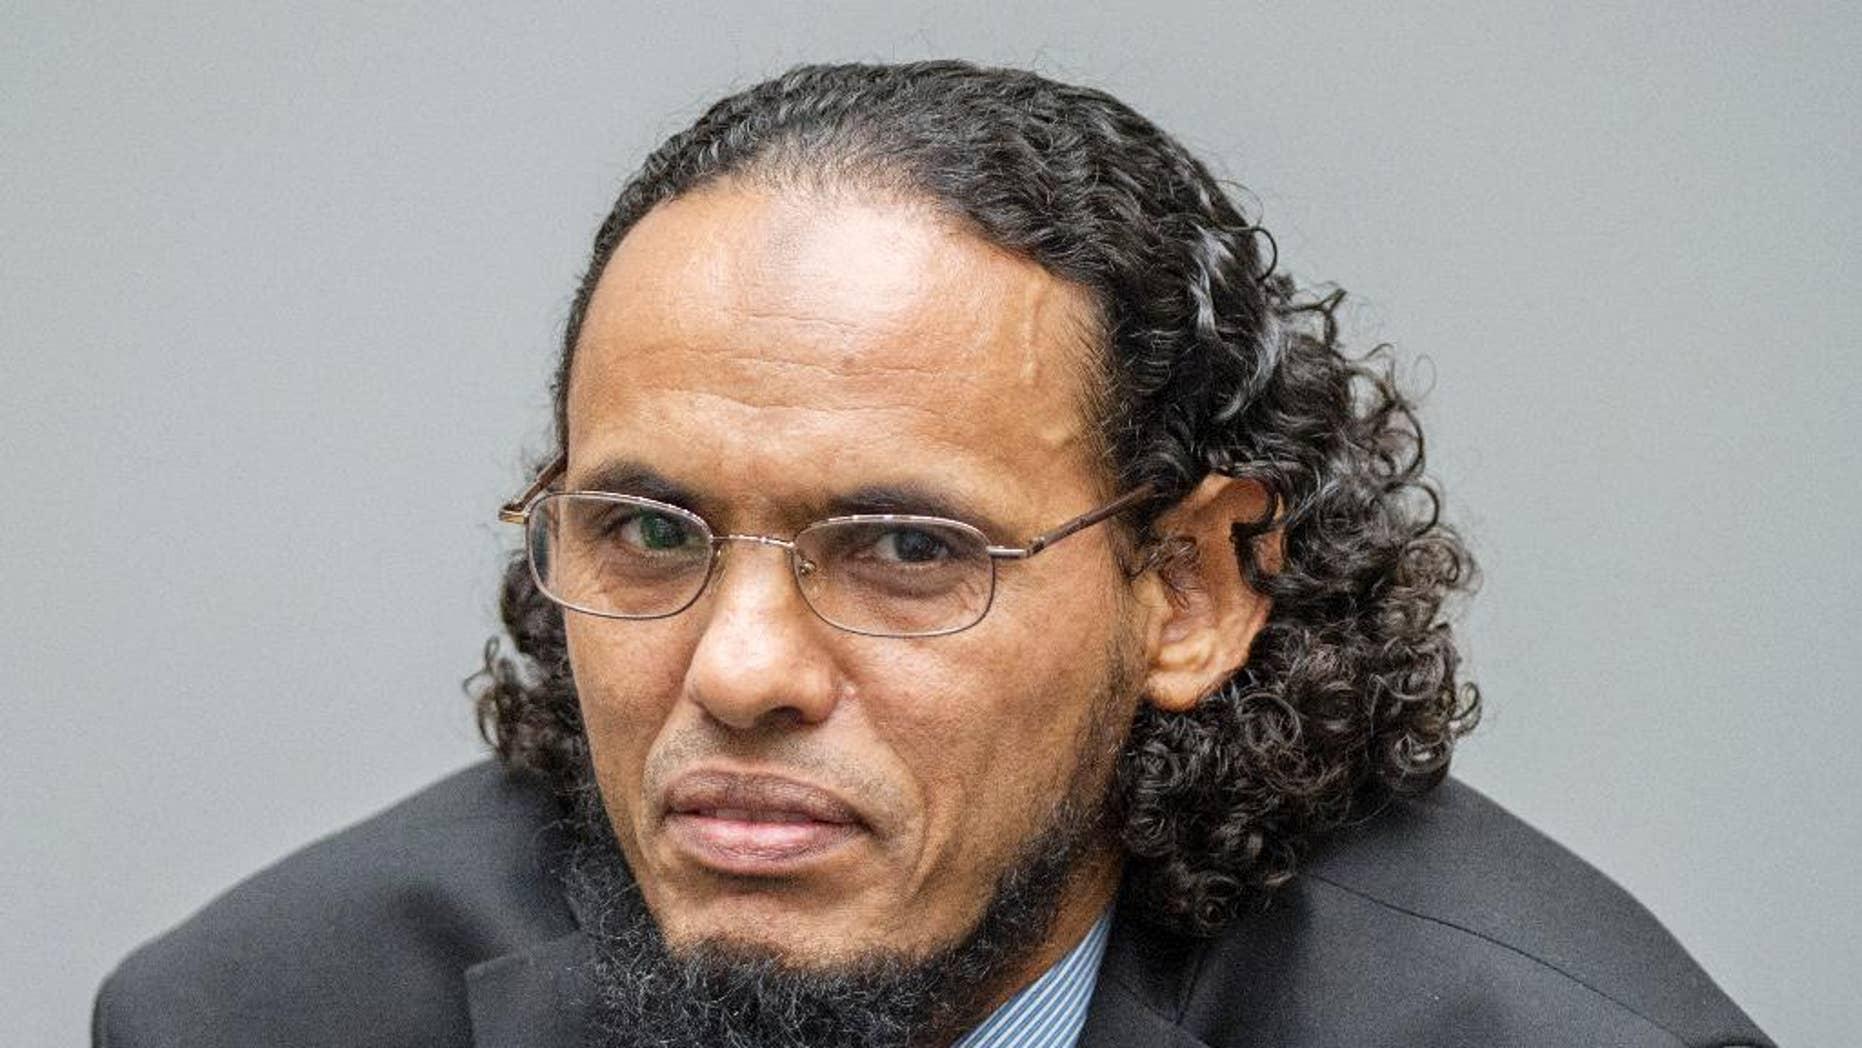 Ahmad Al Faqi Al Mahdi at the International Criminal Court in The Hague.